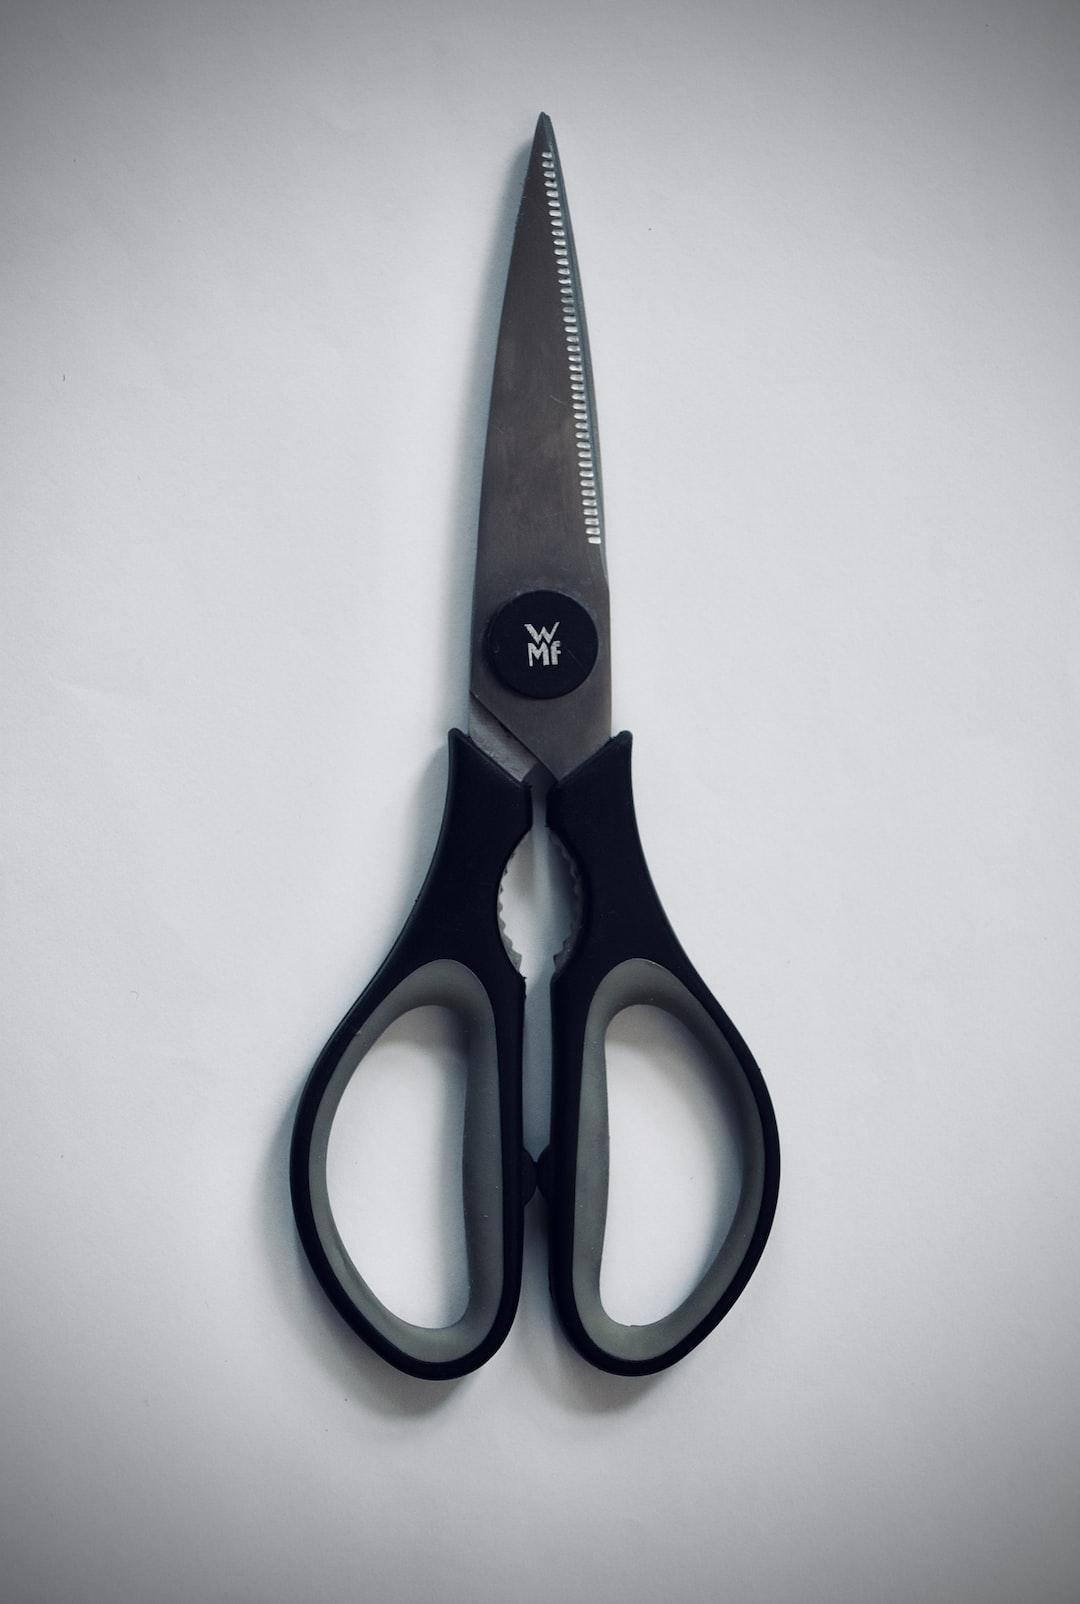 WMF scissors, by Württembergische Metallwarenfabrik, a german company founded in 1853. End of story.